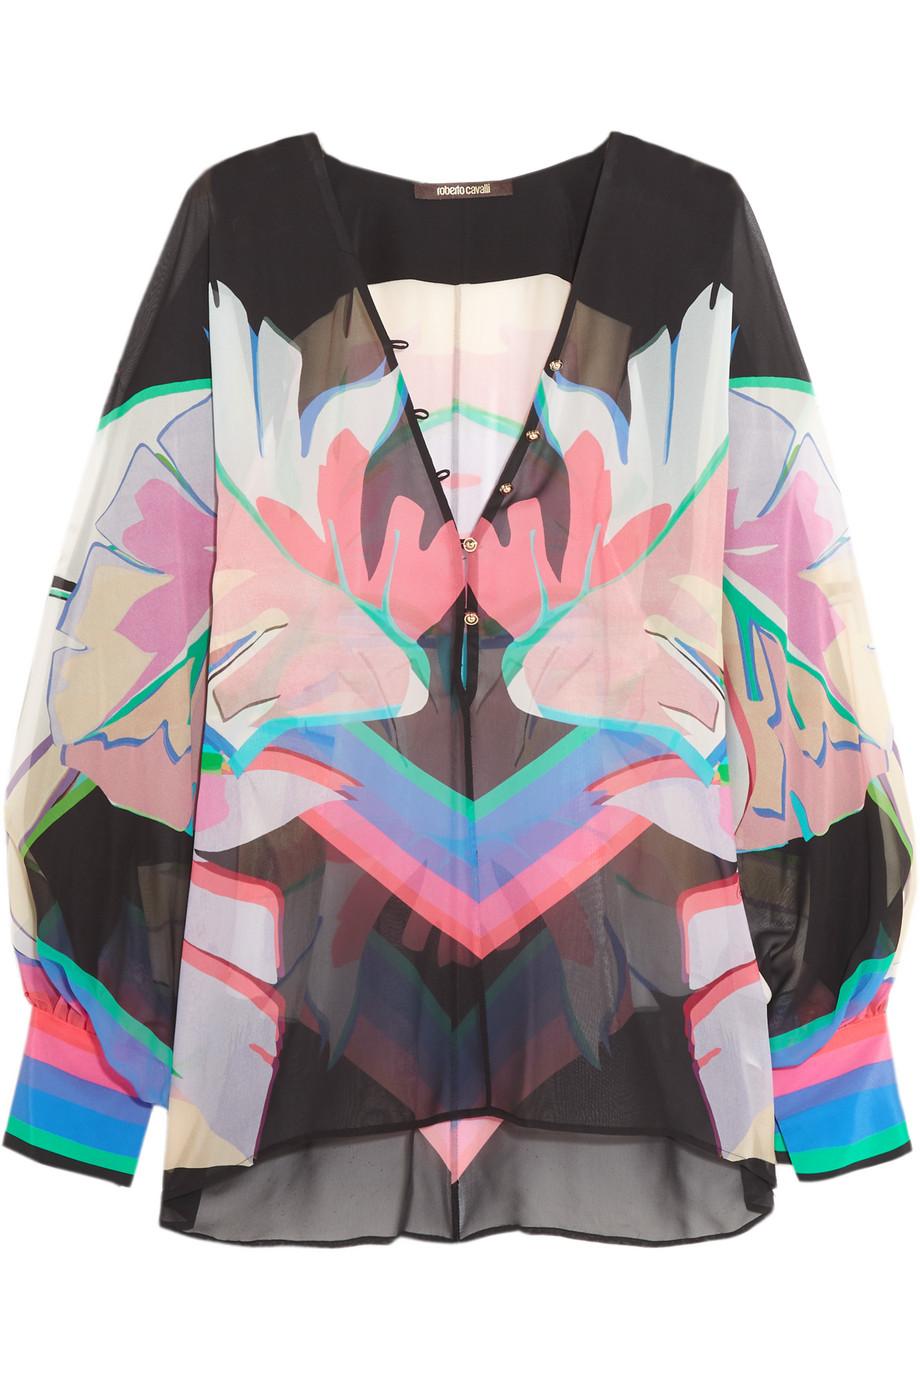 Roberto Cavalli Printed Silk-Chiffon Blouse, Pink, Women's, Size: 38